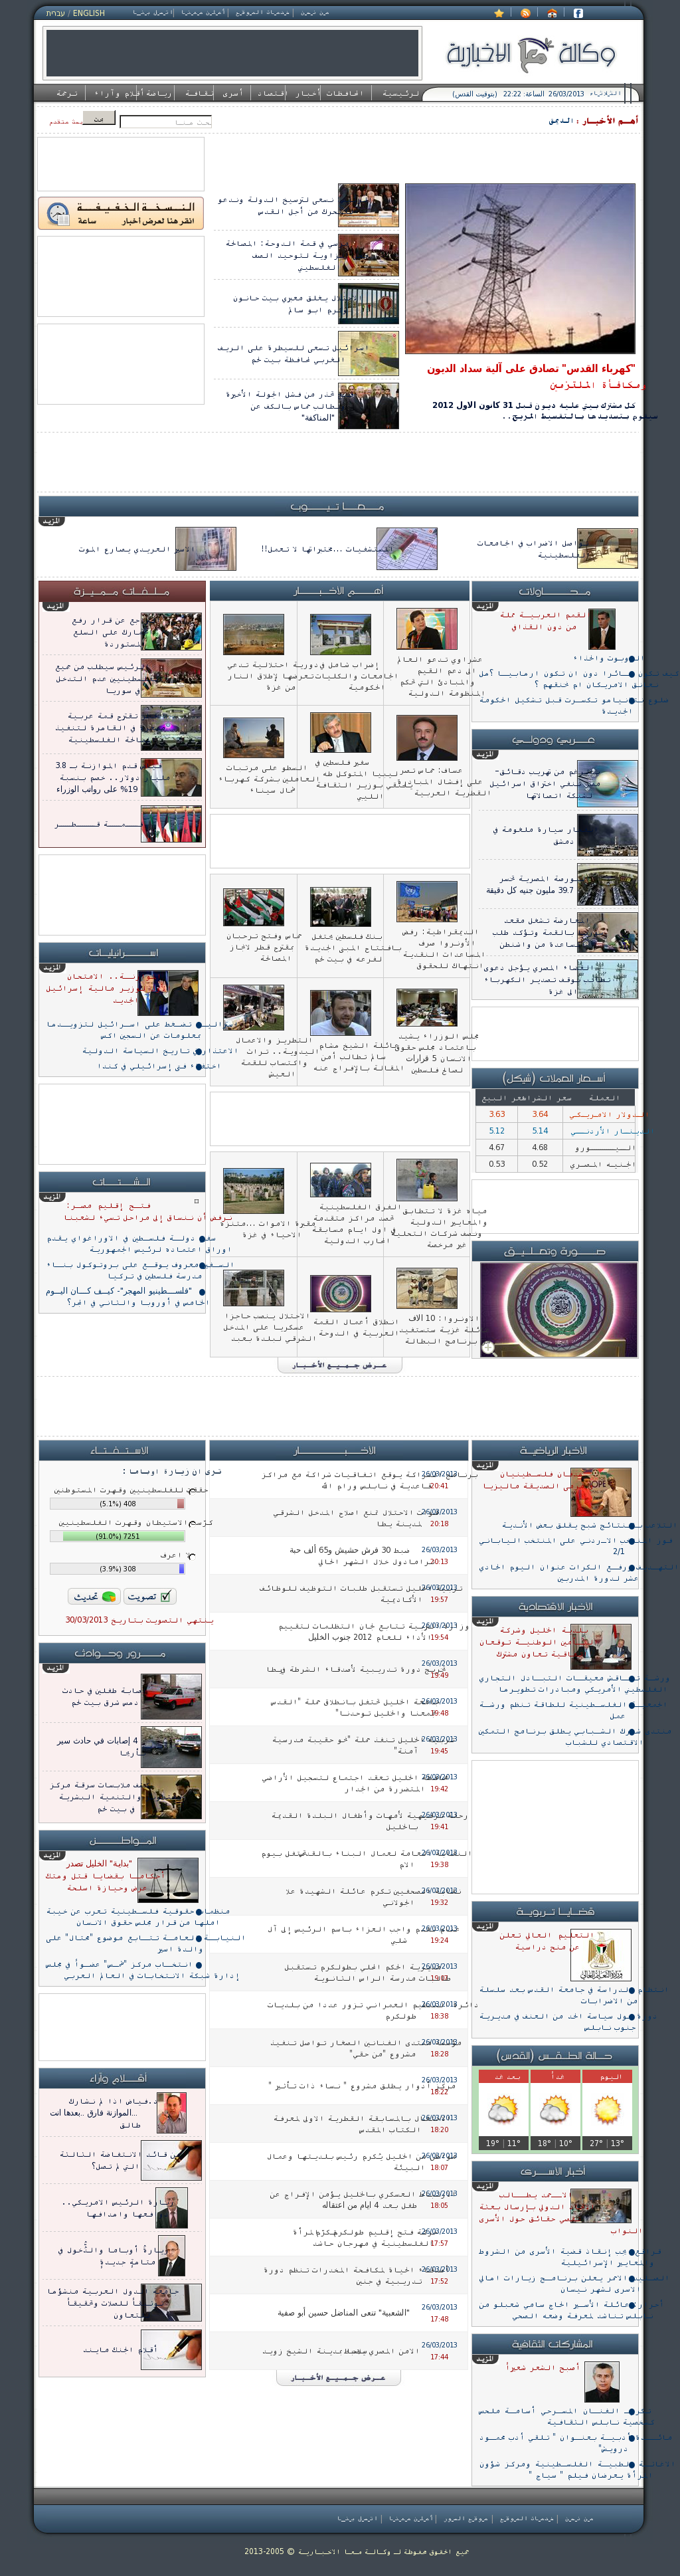 Ma'an News at Tuesday March 26, 2013, 8:22 p.m. UTC